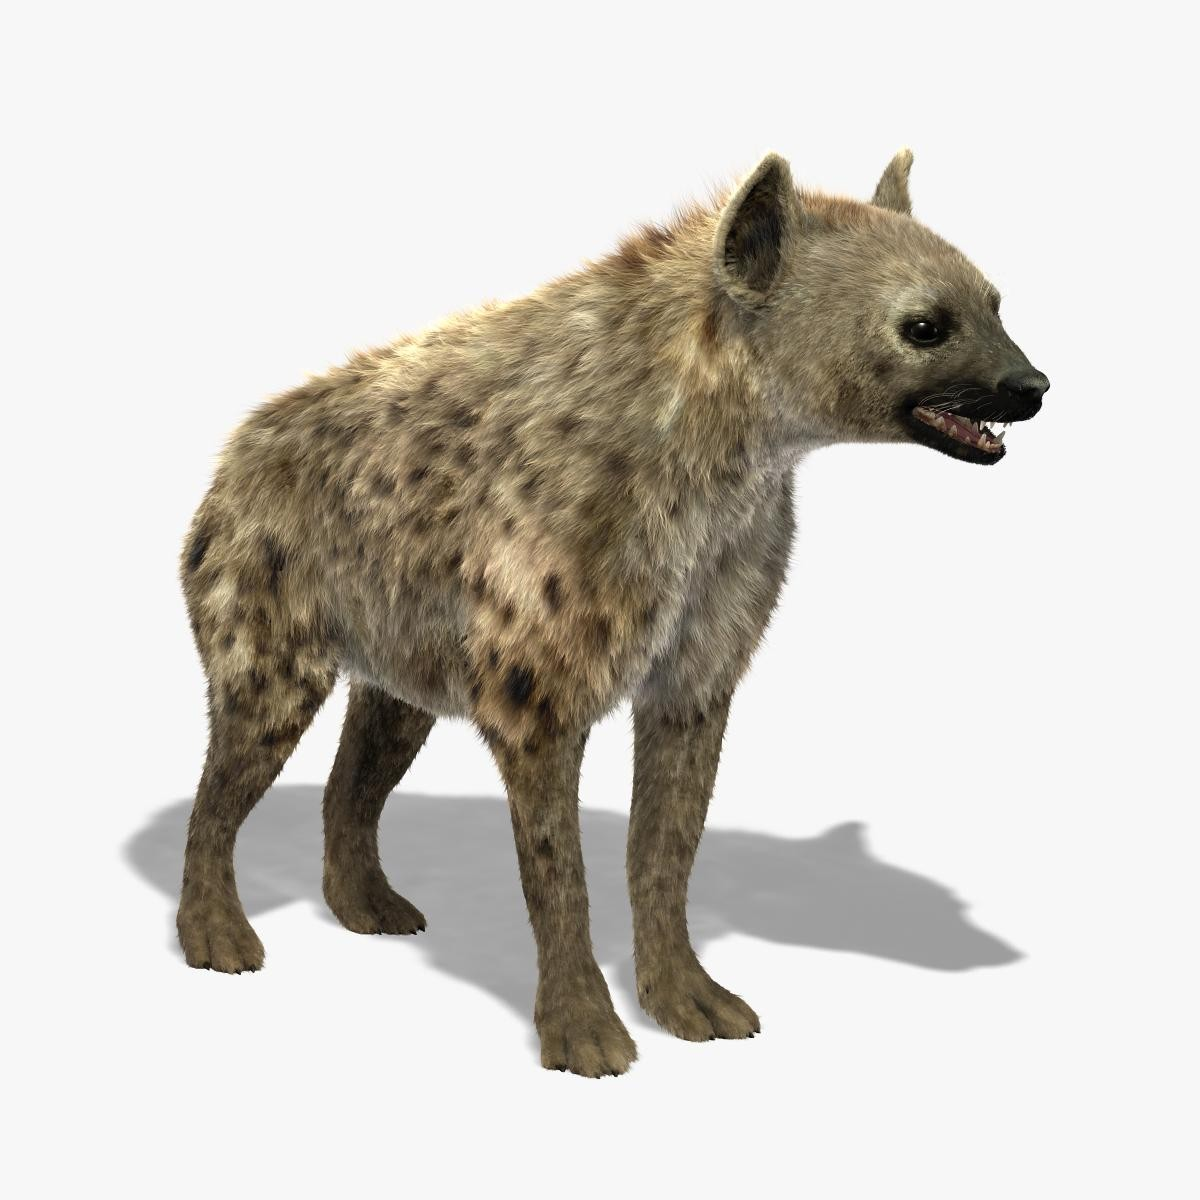 3d model of hyena shave modeled